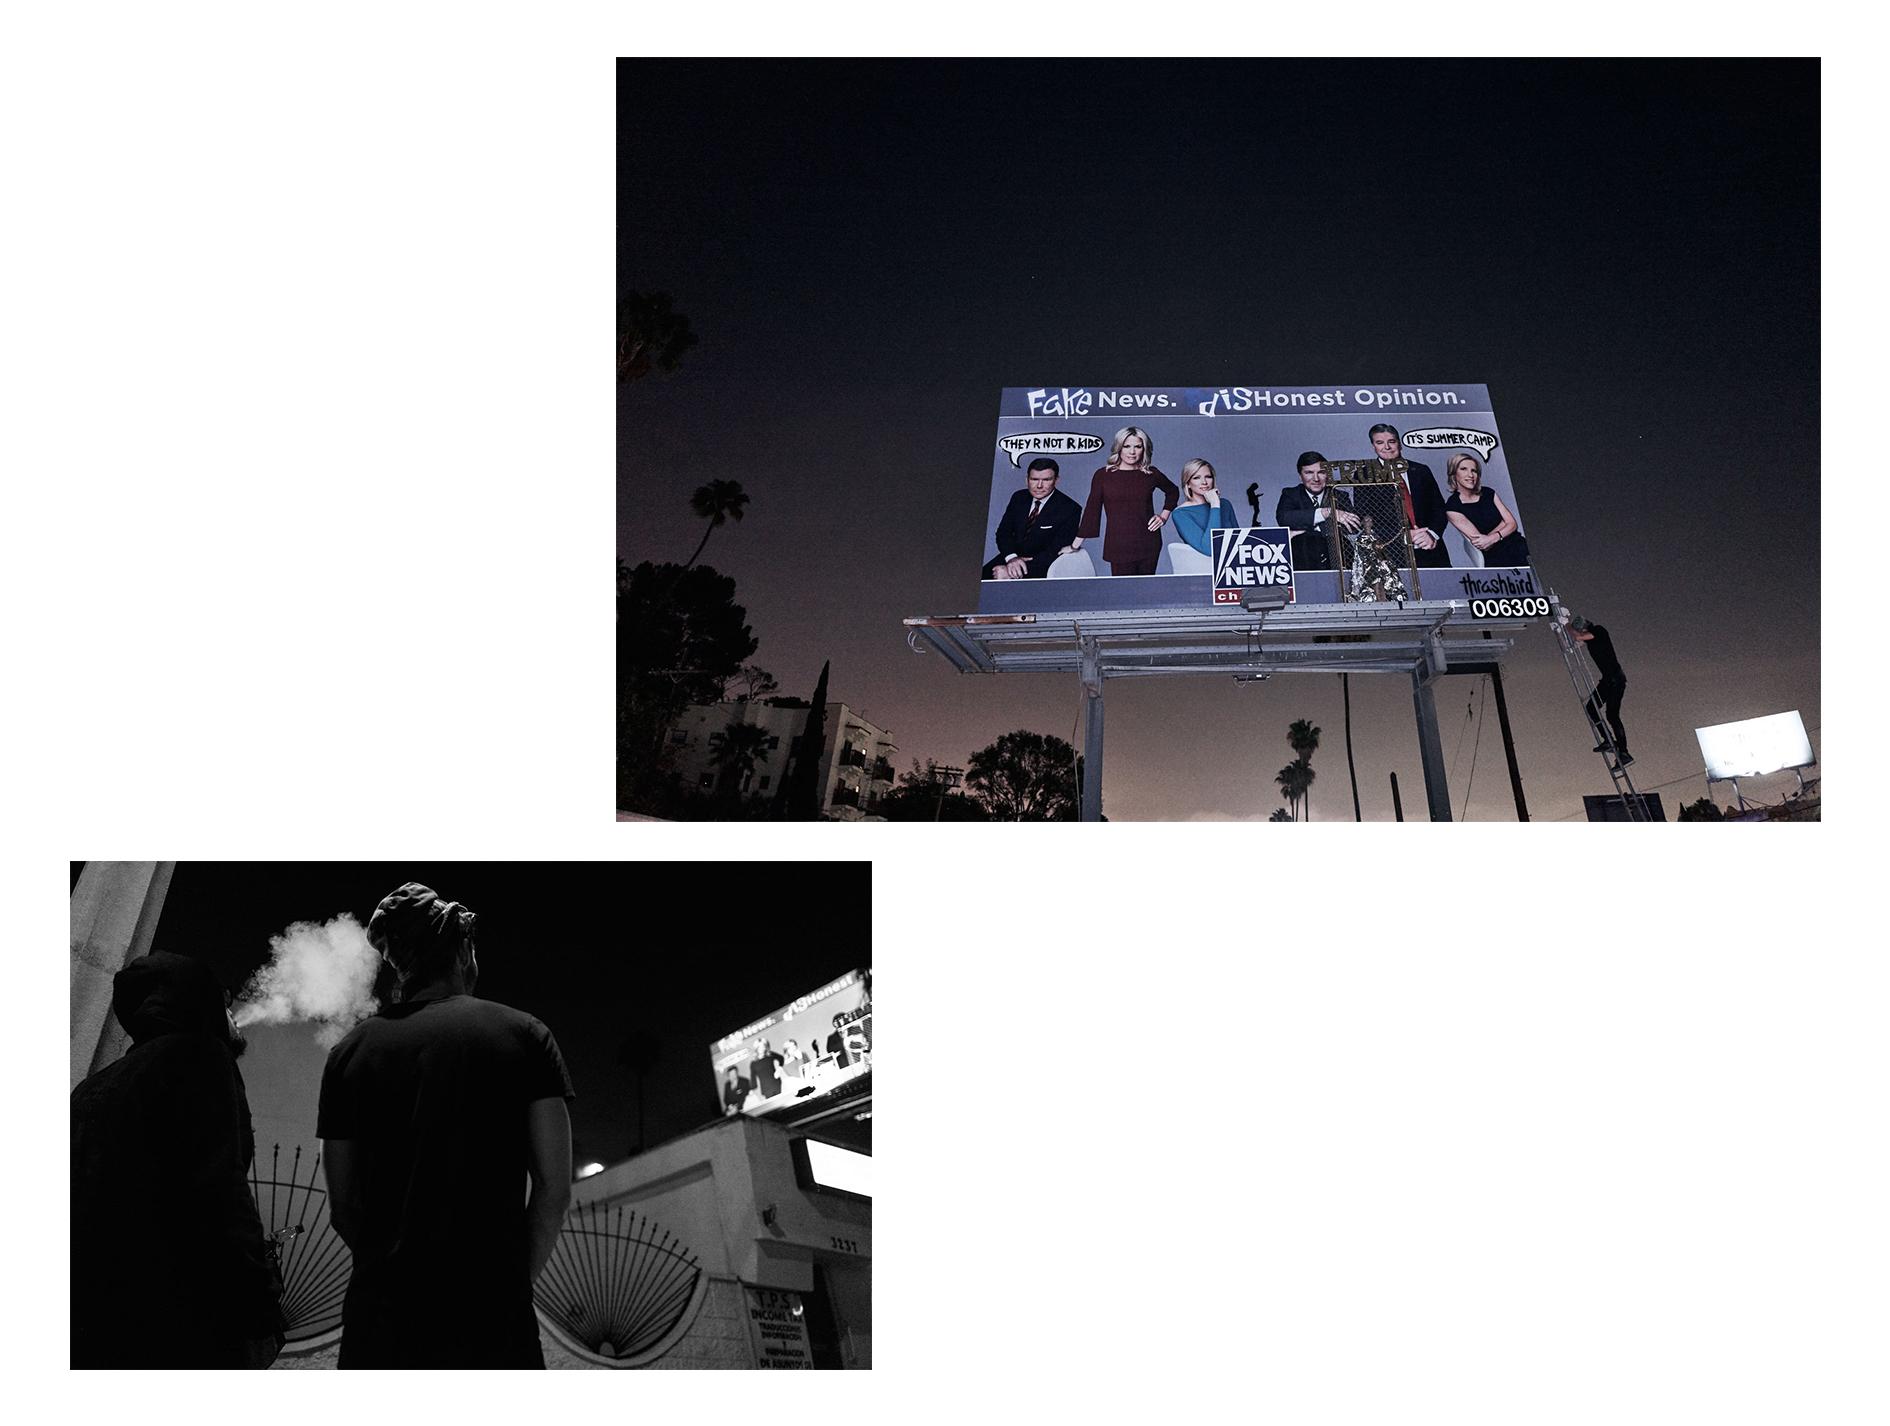 Billboard_Img-13.jpg